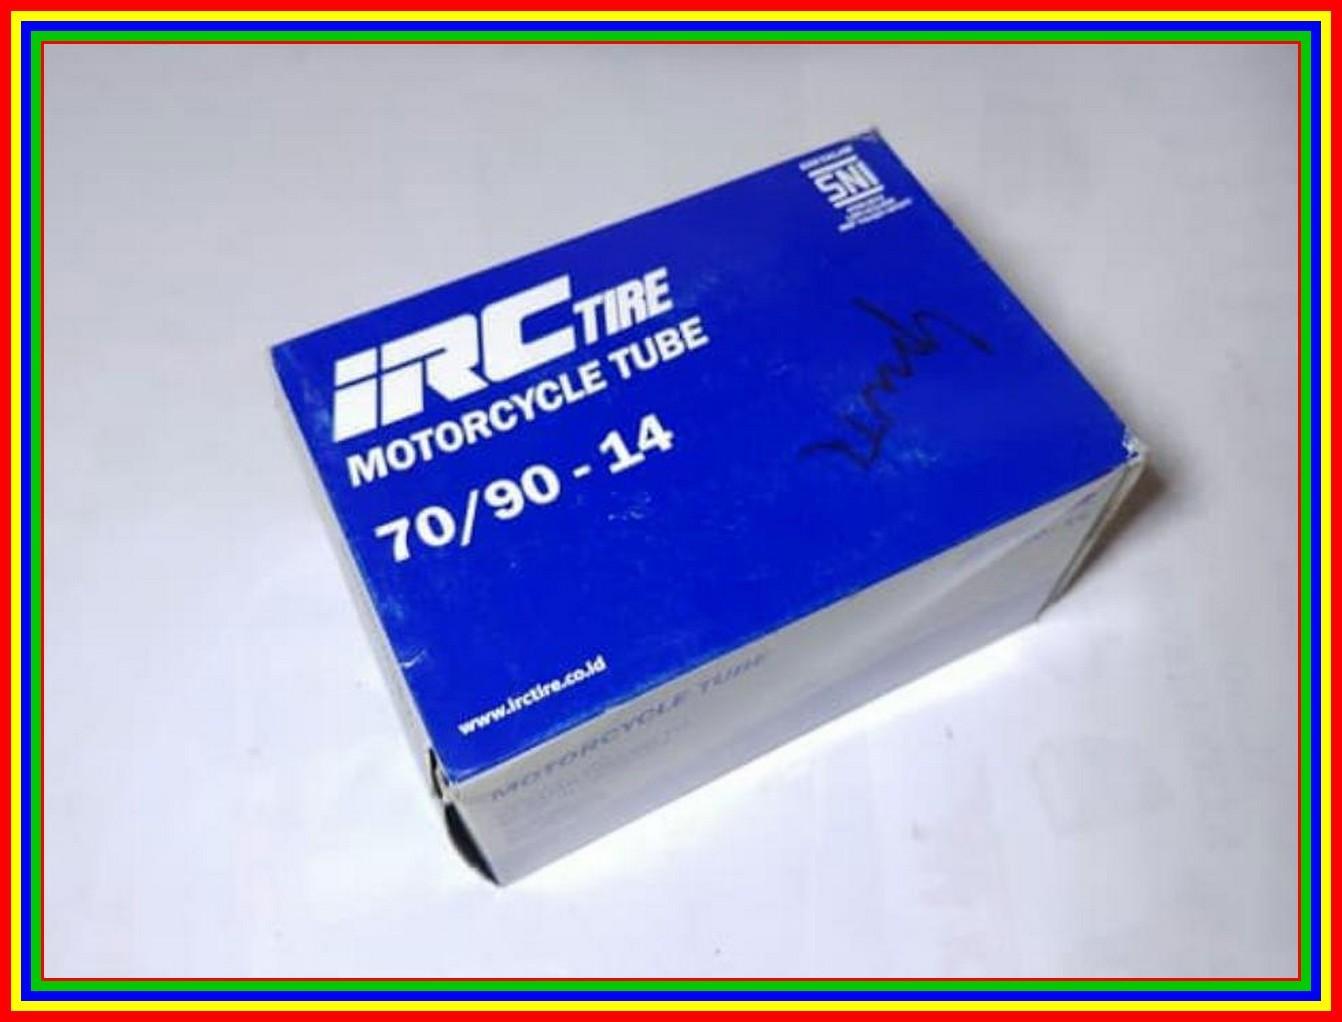 Ban Dalam Irc 70/90 14 Ban Dalam Depan Mio Fino Xeon Dll By Pusat Remote.